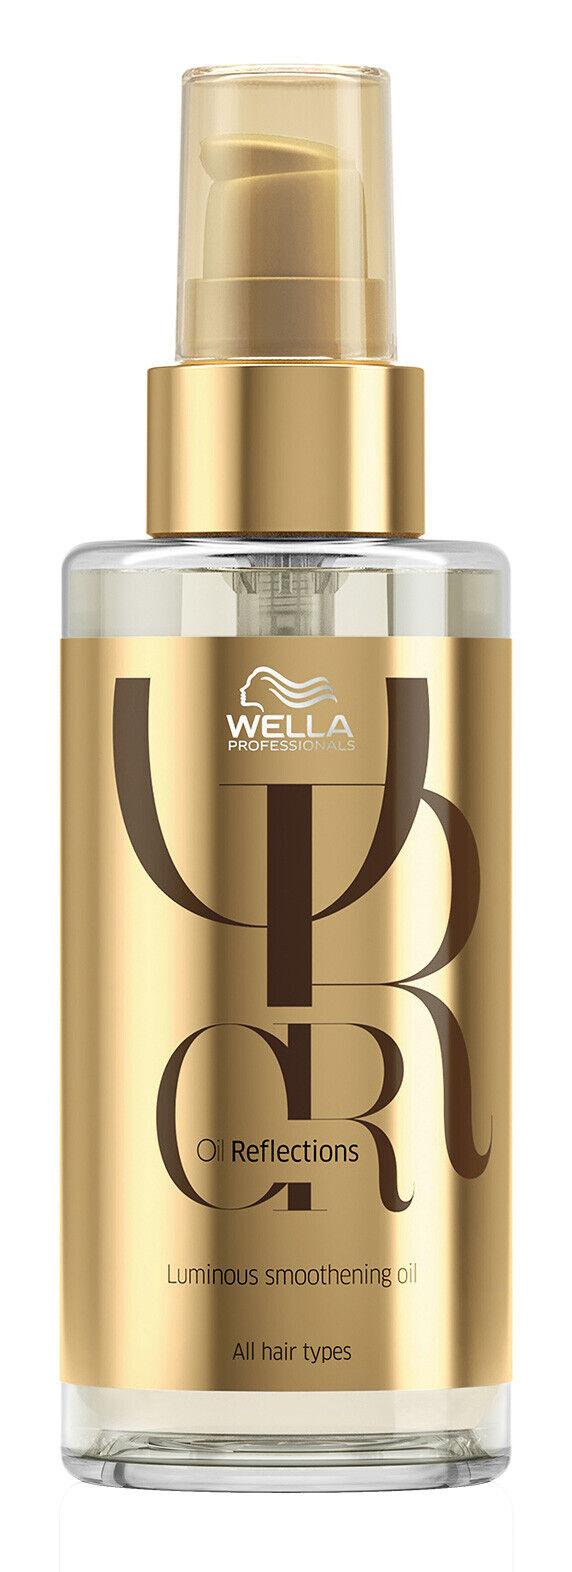 Wella Oil Reflections Smoothening Oil 100 ml - Haarpflegeöl